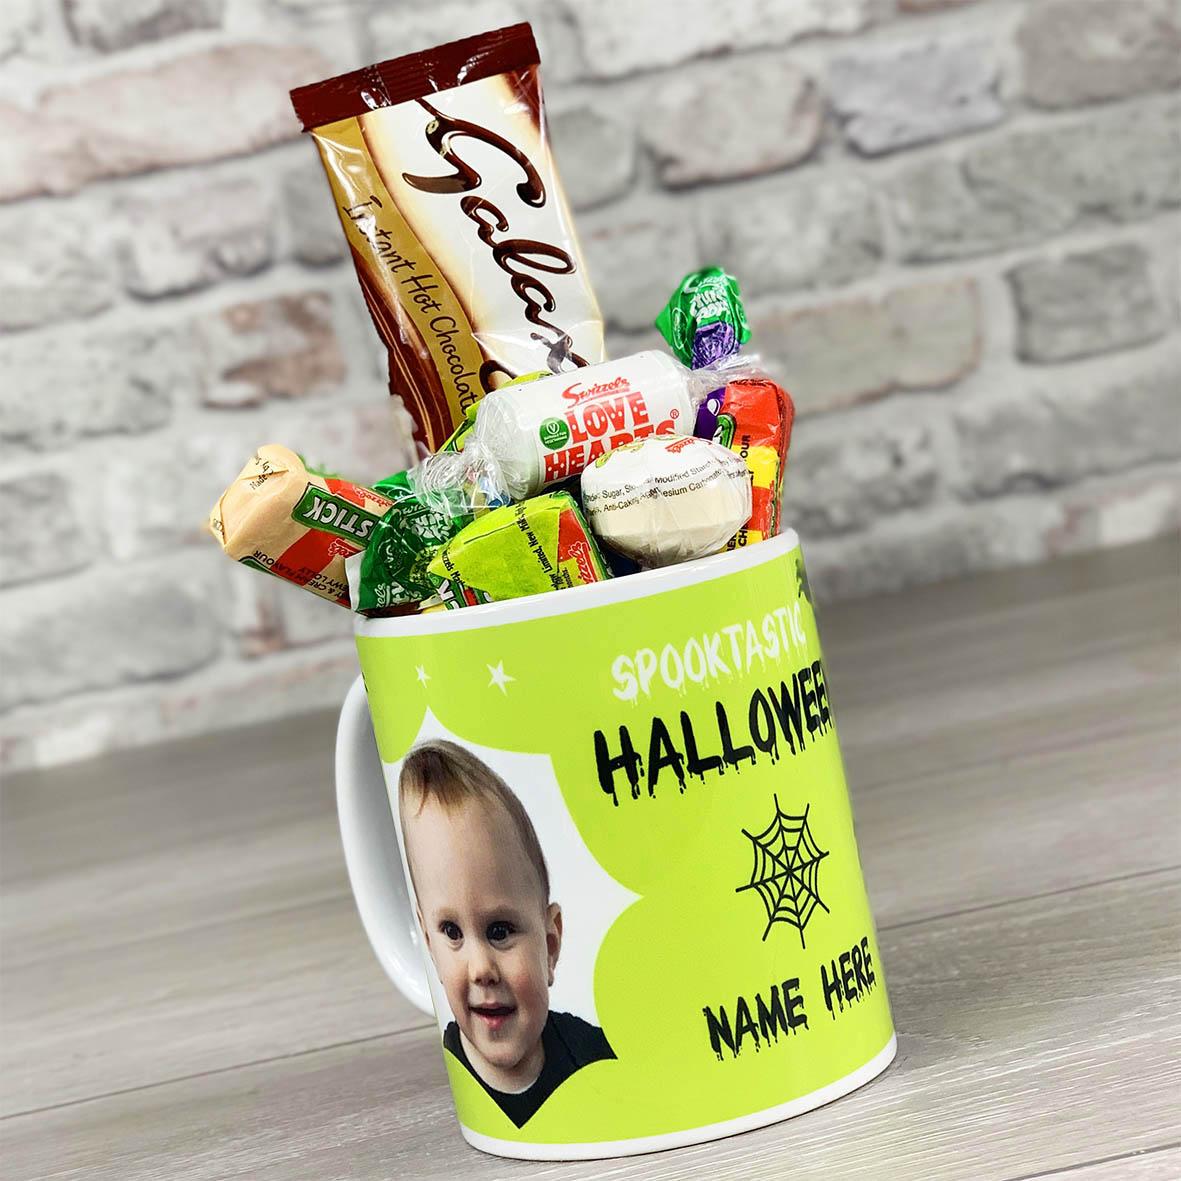 Spooktastic Halloween Photo Upload - Personalised Mug With Sweets